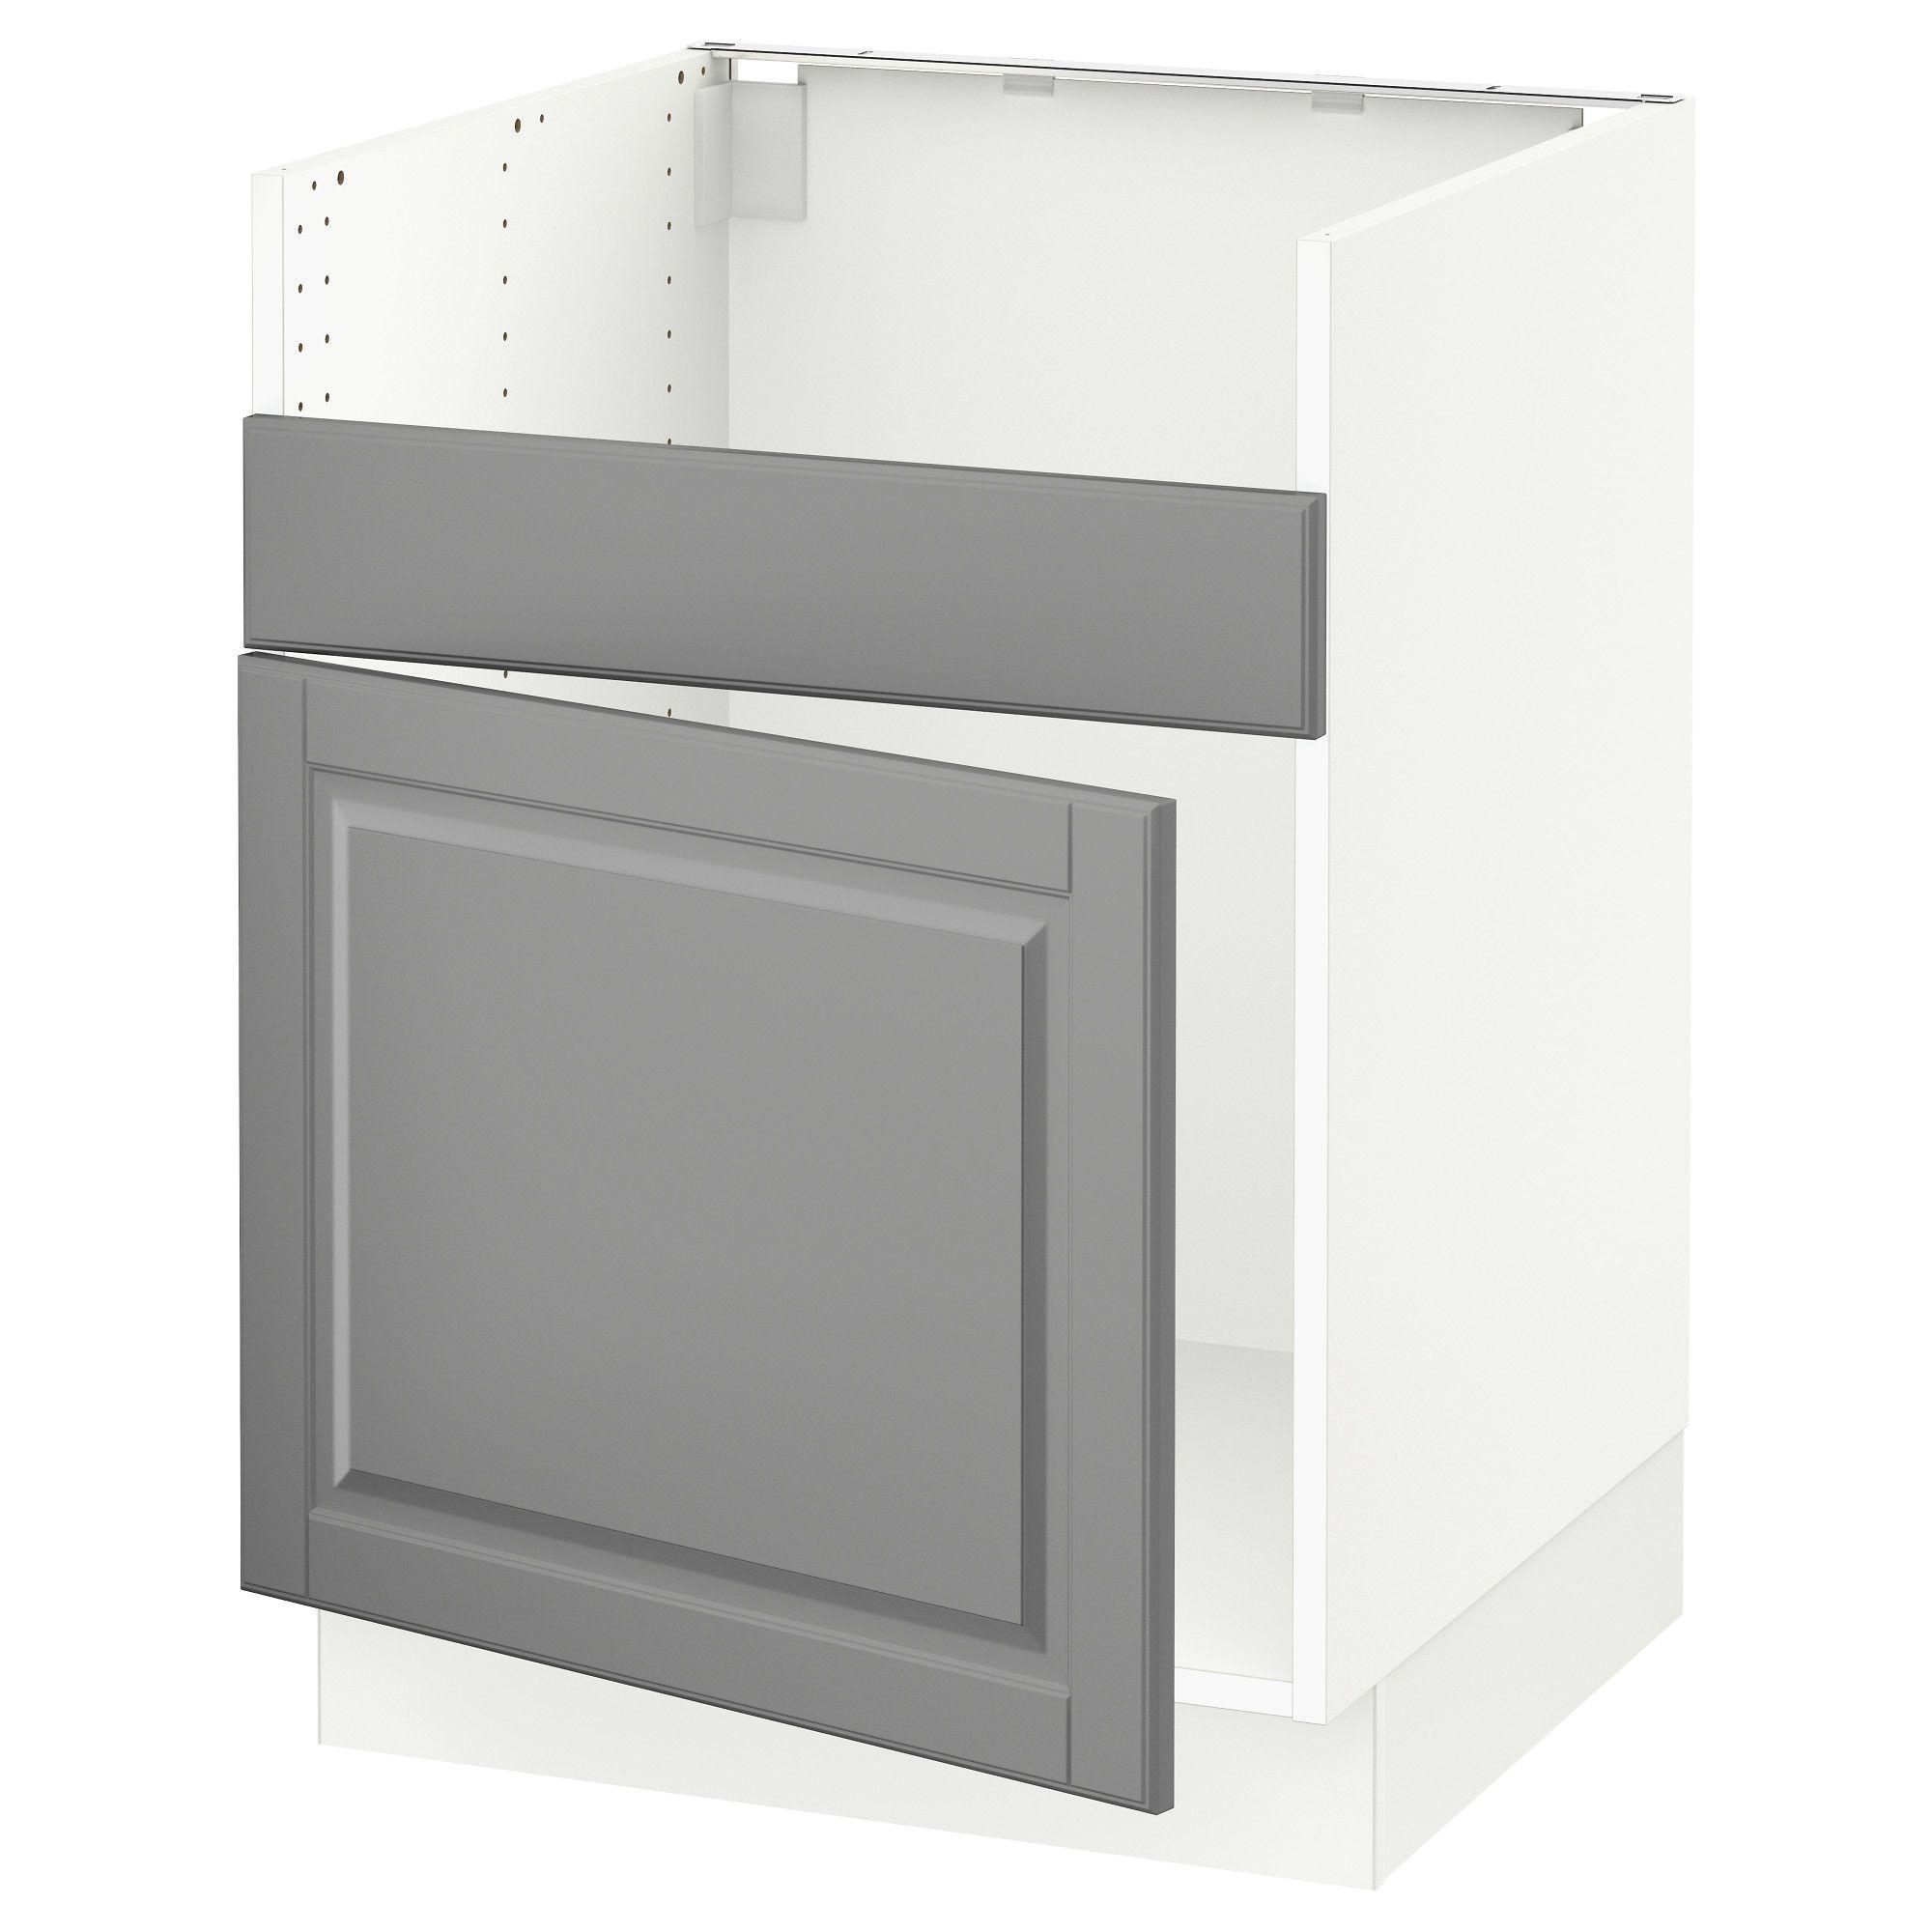 Ikea Sektion White Base Cabinet For Havsen Sink Frame Colour